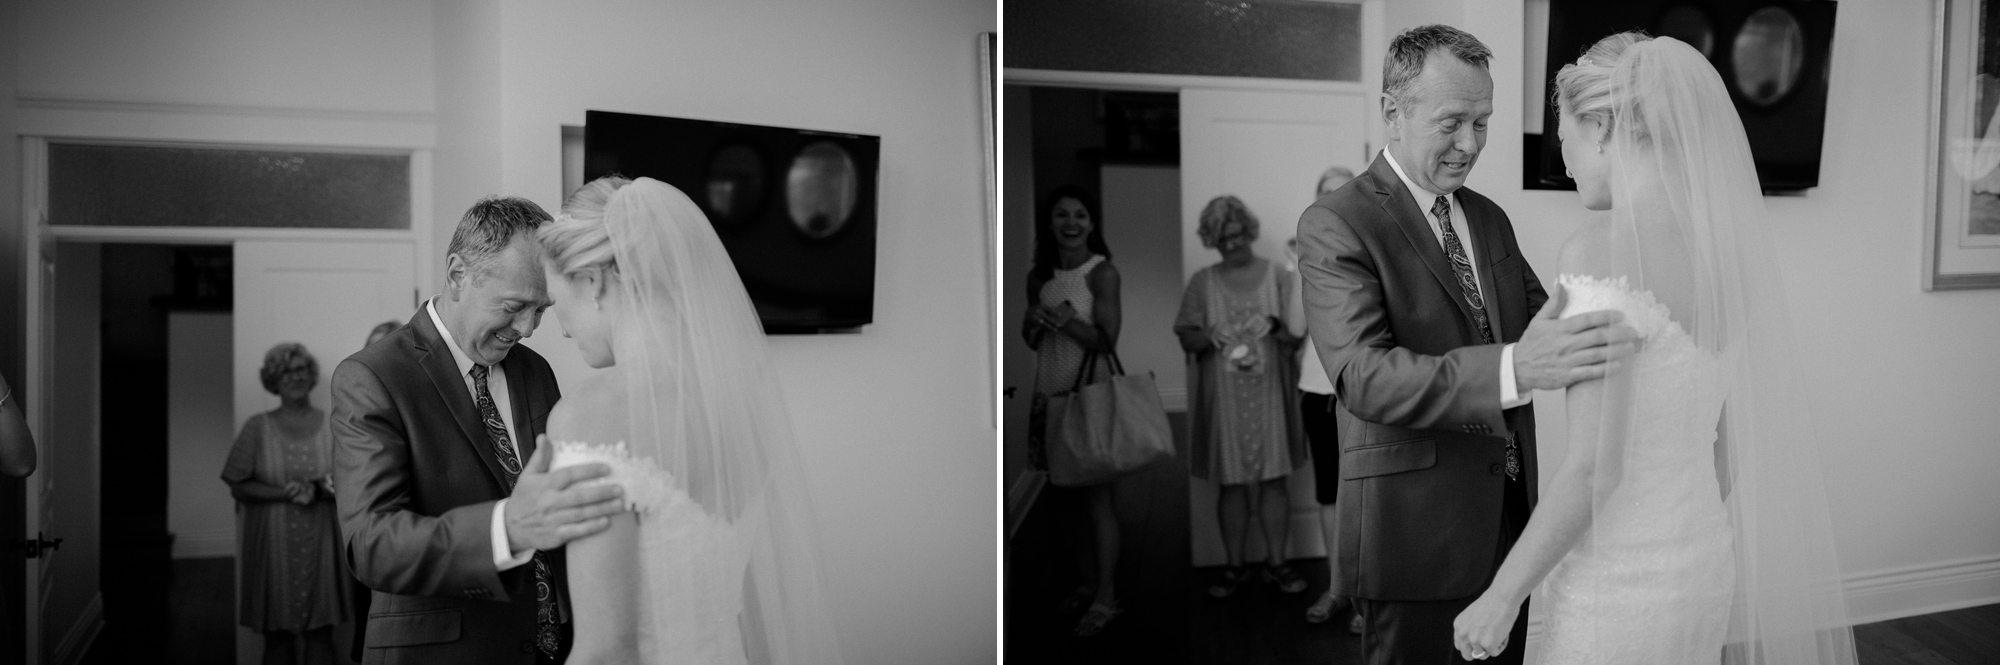 238-kelowna-wedding-photographer